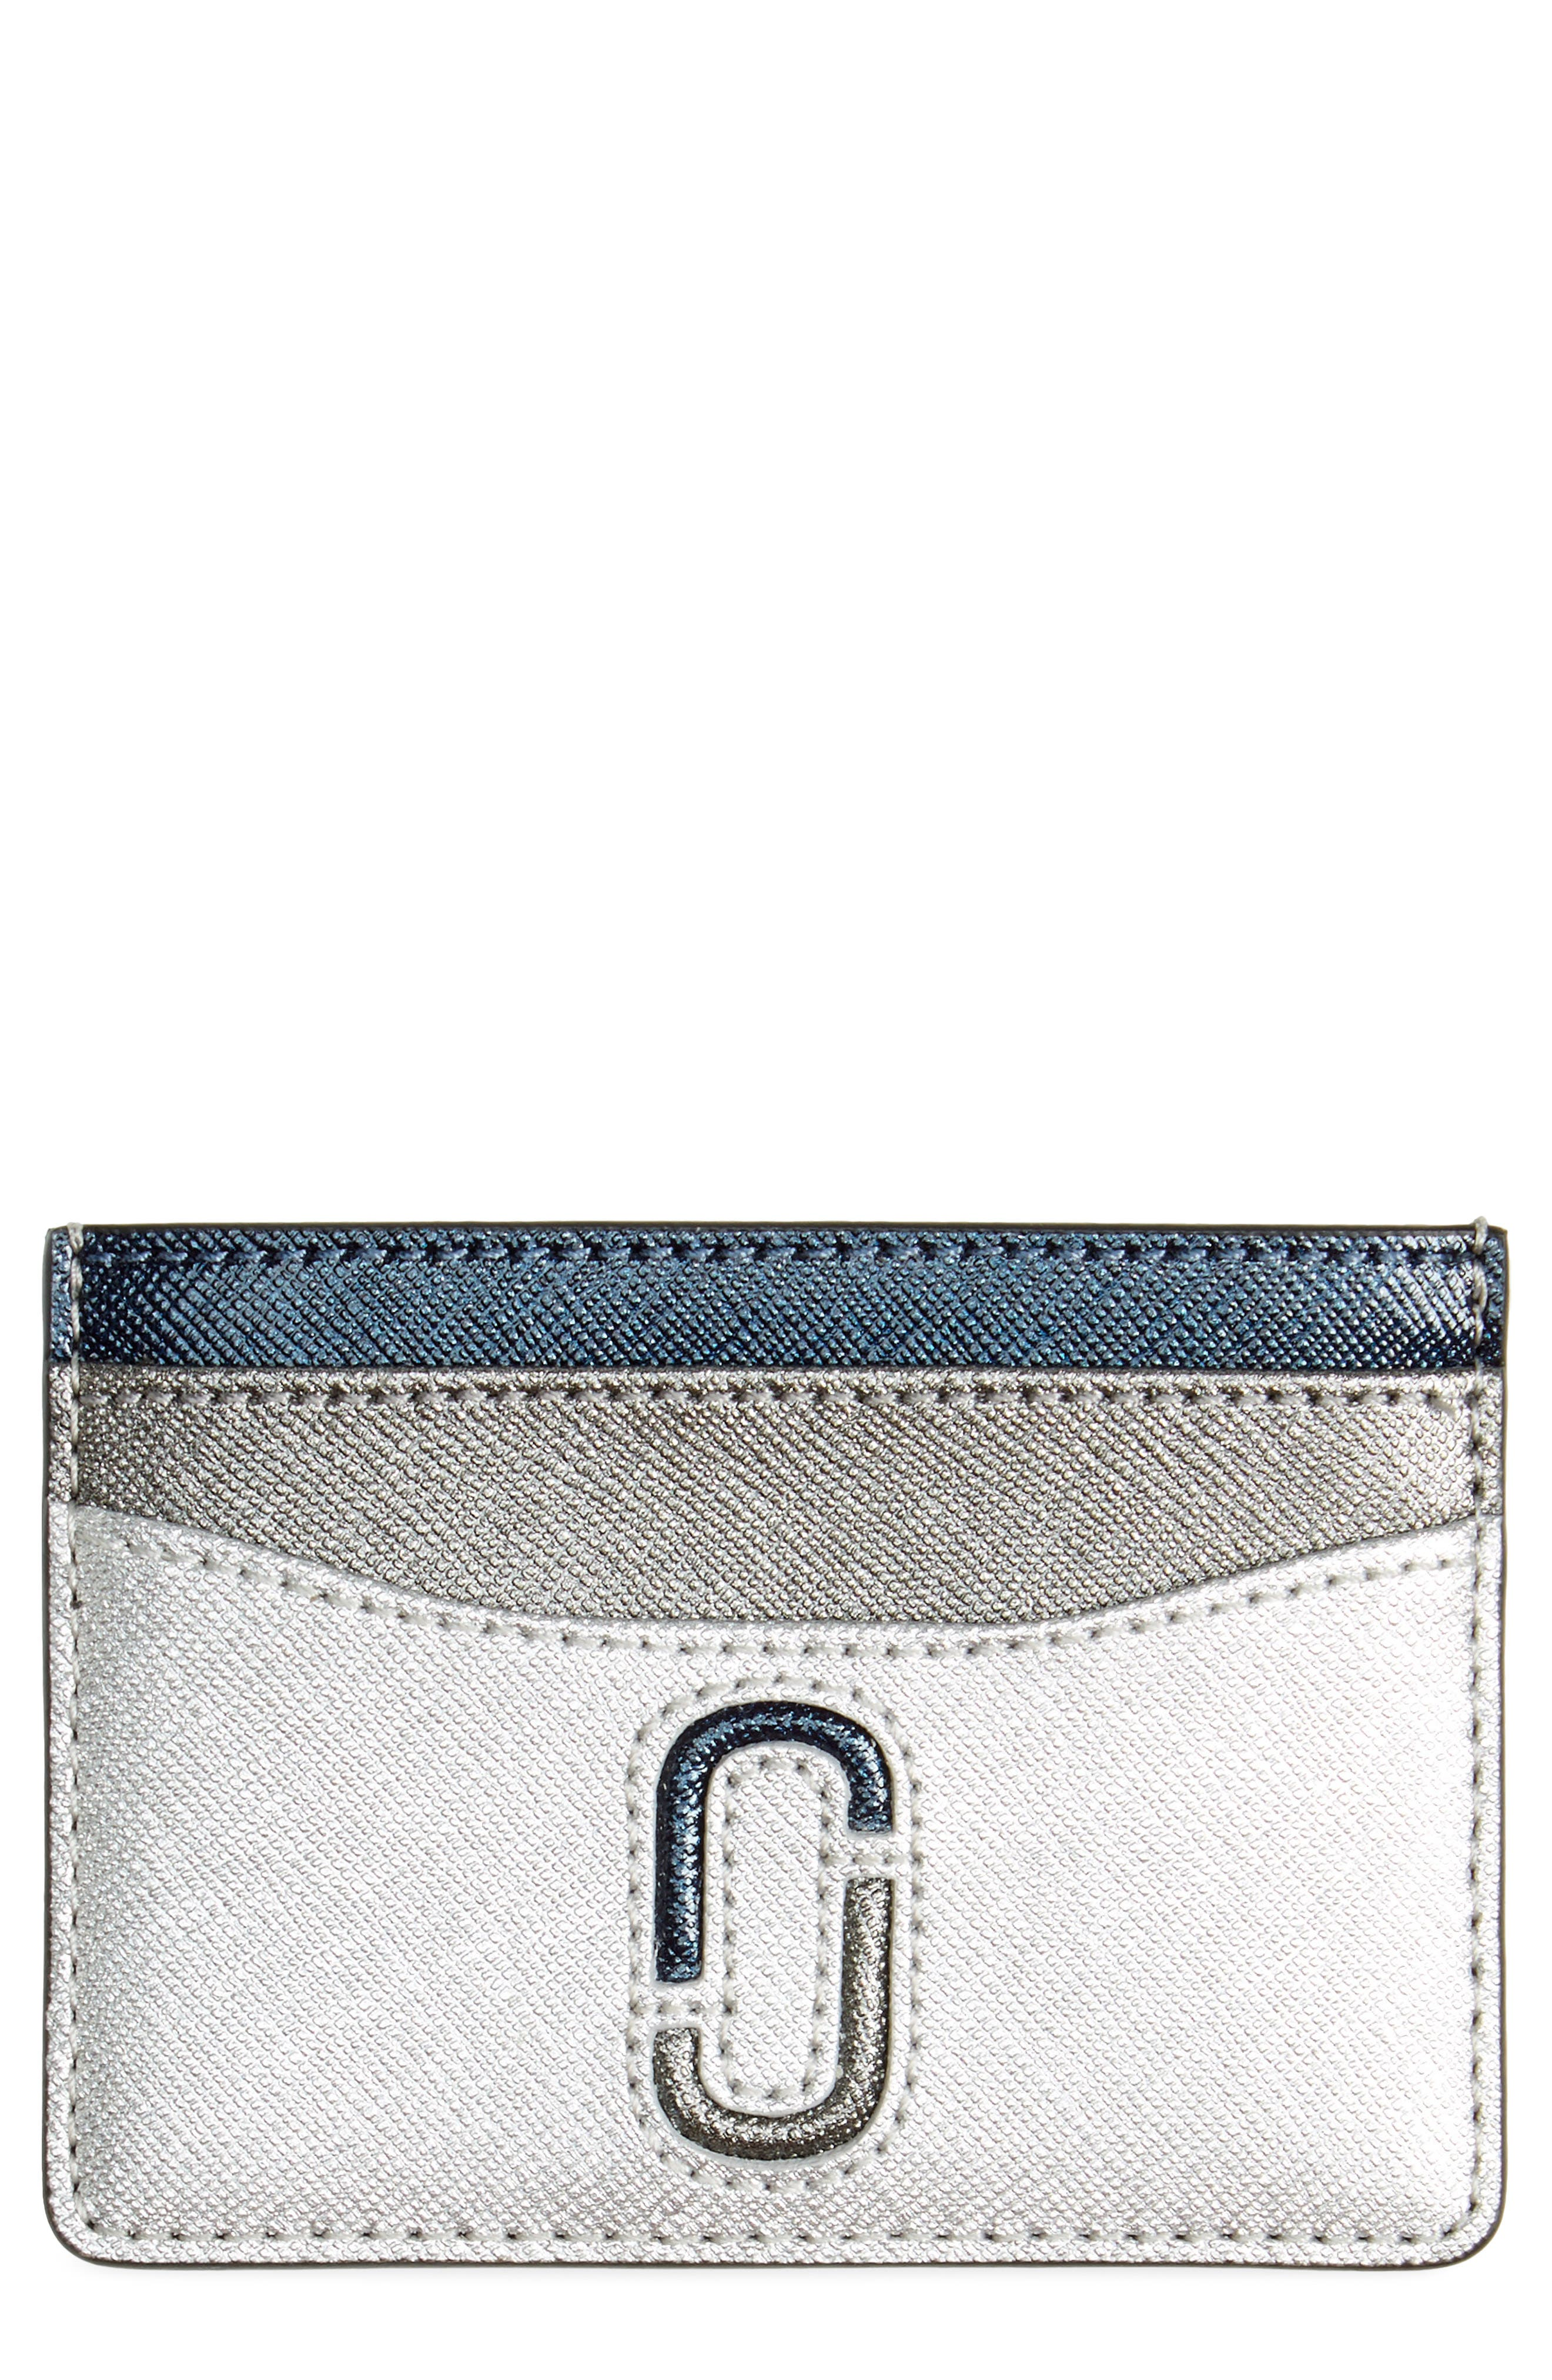 Snapshot Saffiano Leather Card Case,                         Main,                         color, Silver Multi